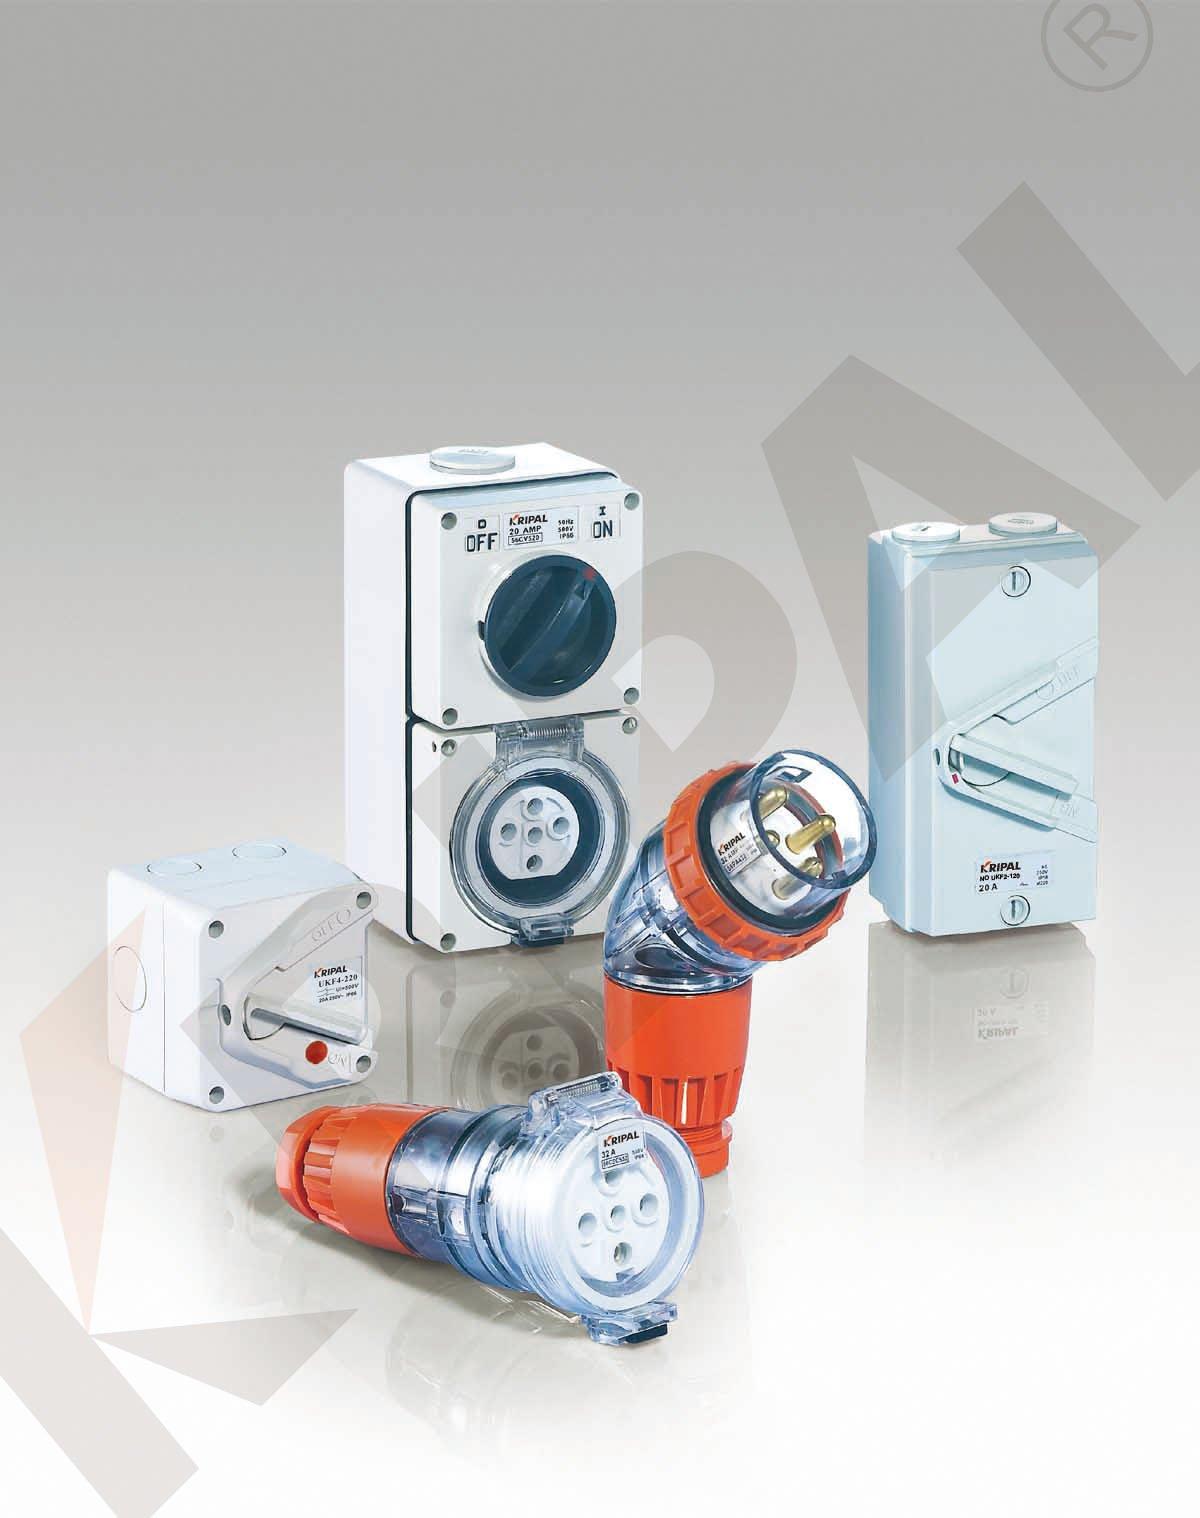 Waterproof Isolator Switch Plug Waterproof Socket Terminal